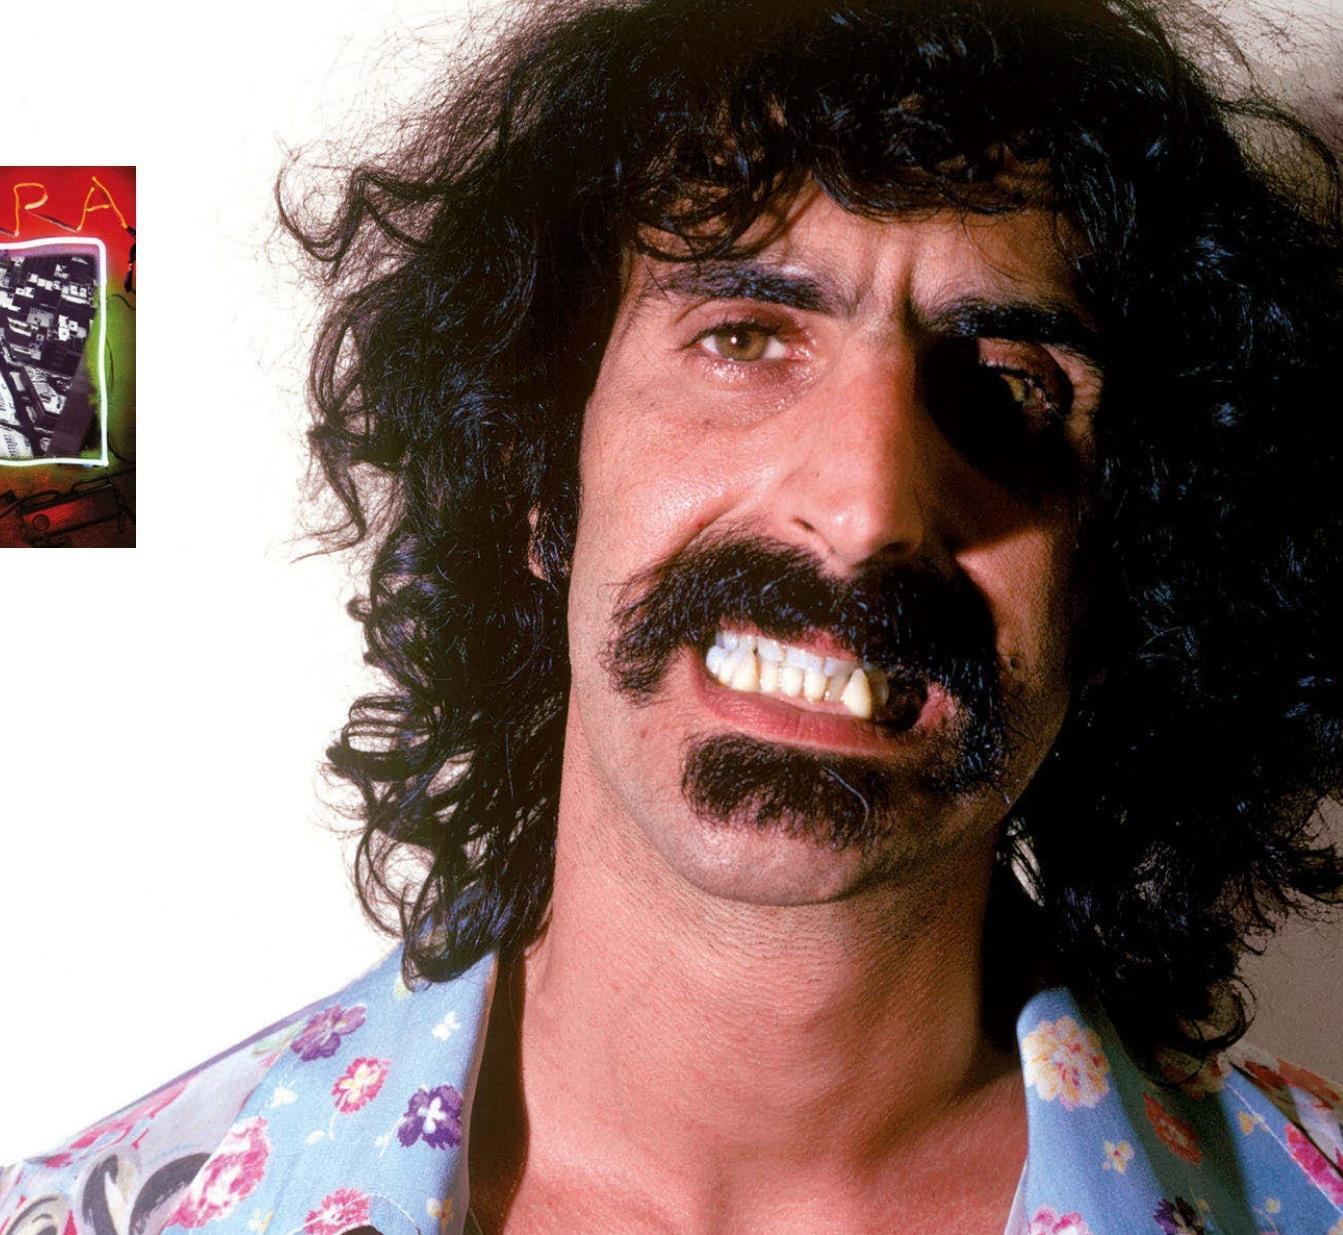 par Guy Darol / photos X/DR (Zappa Records / Universal)